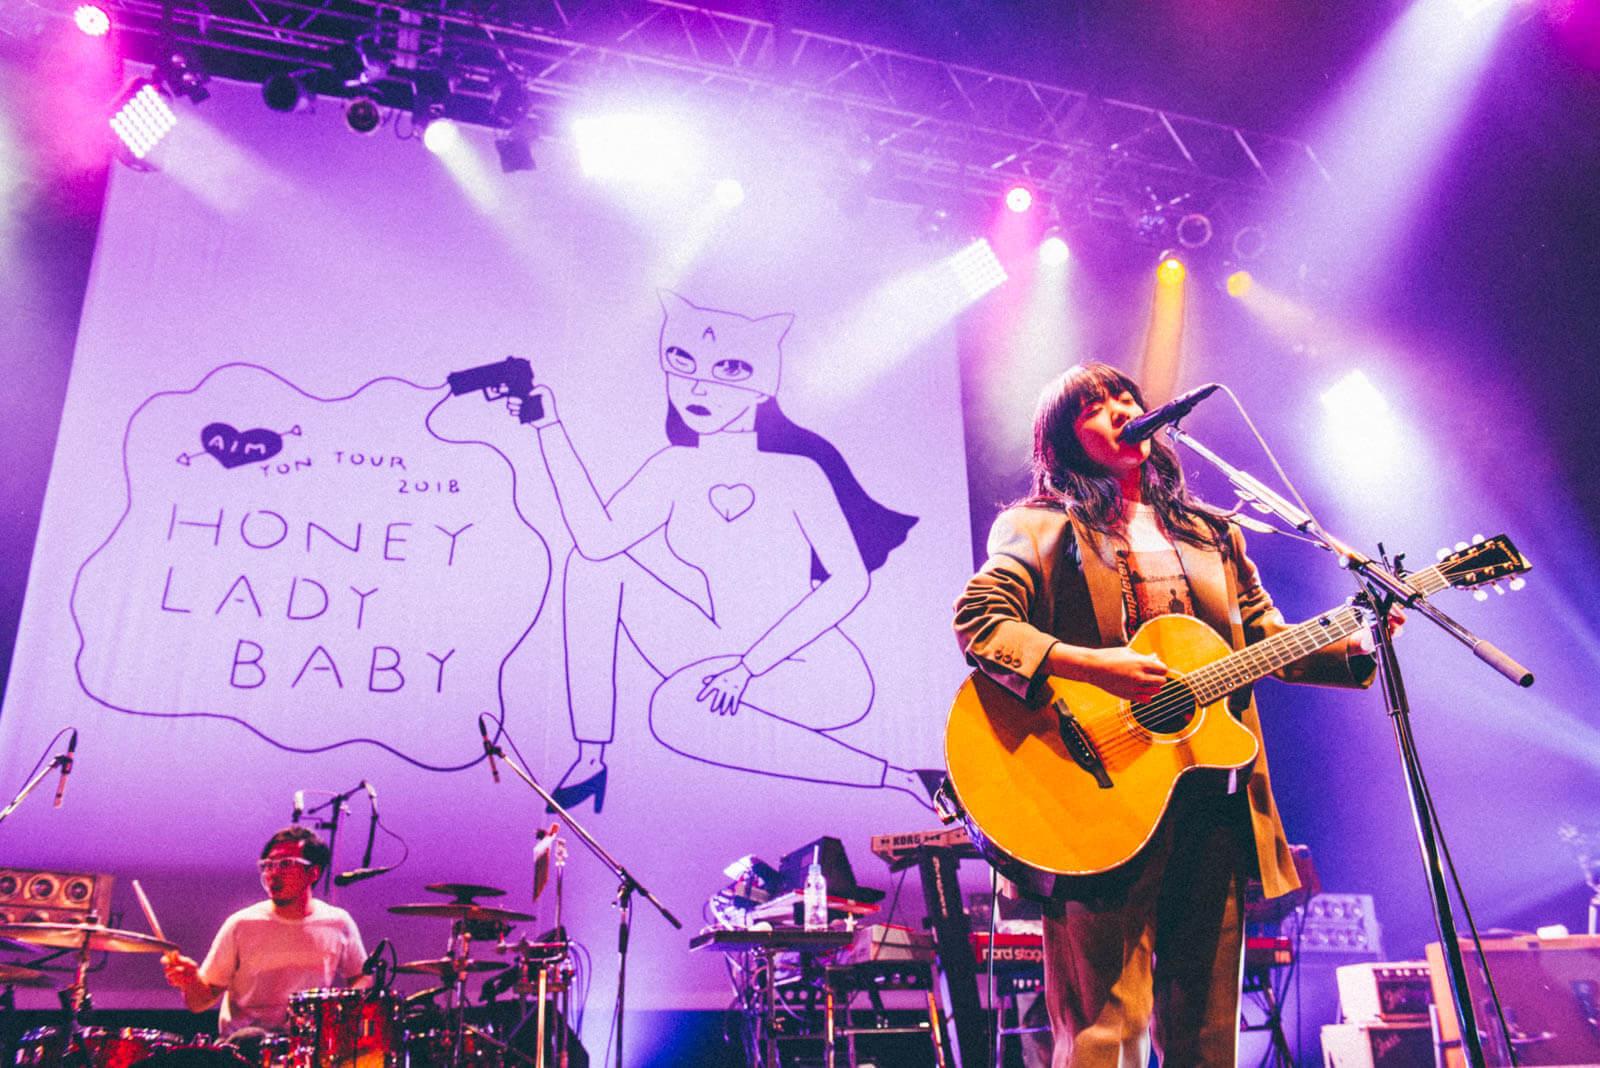 【Live report】愛繆日本全國巡演最終公演在Zepp Tokyo展開 愛繆、